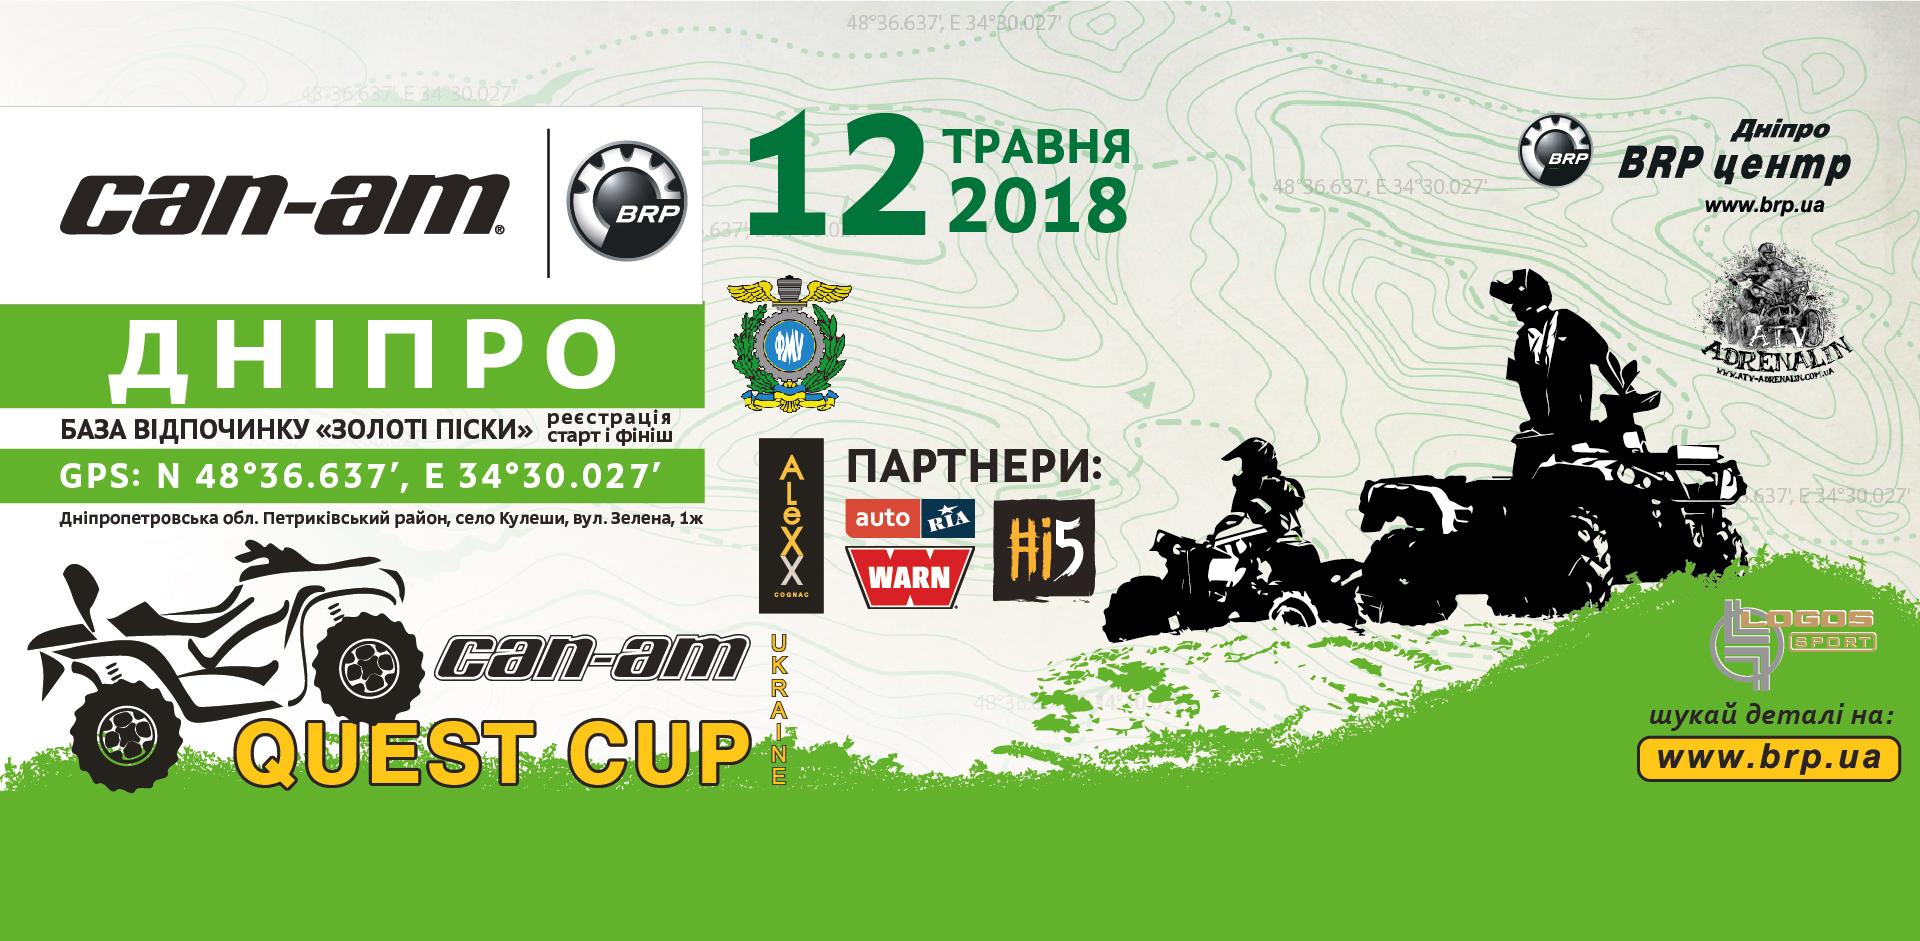 Серія «CAN-AM QUEST CUP 2018»! Другий етап — Дніпро.